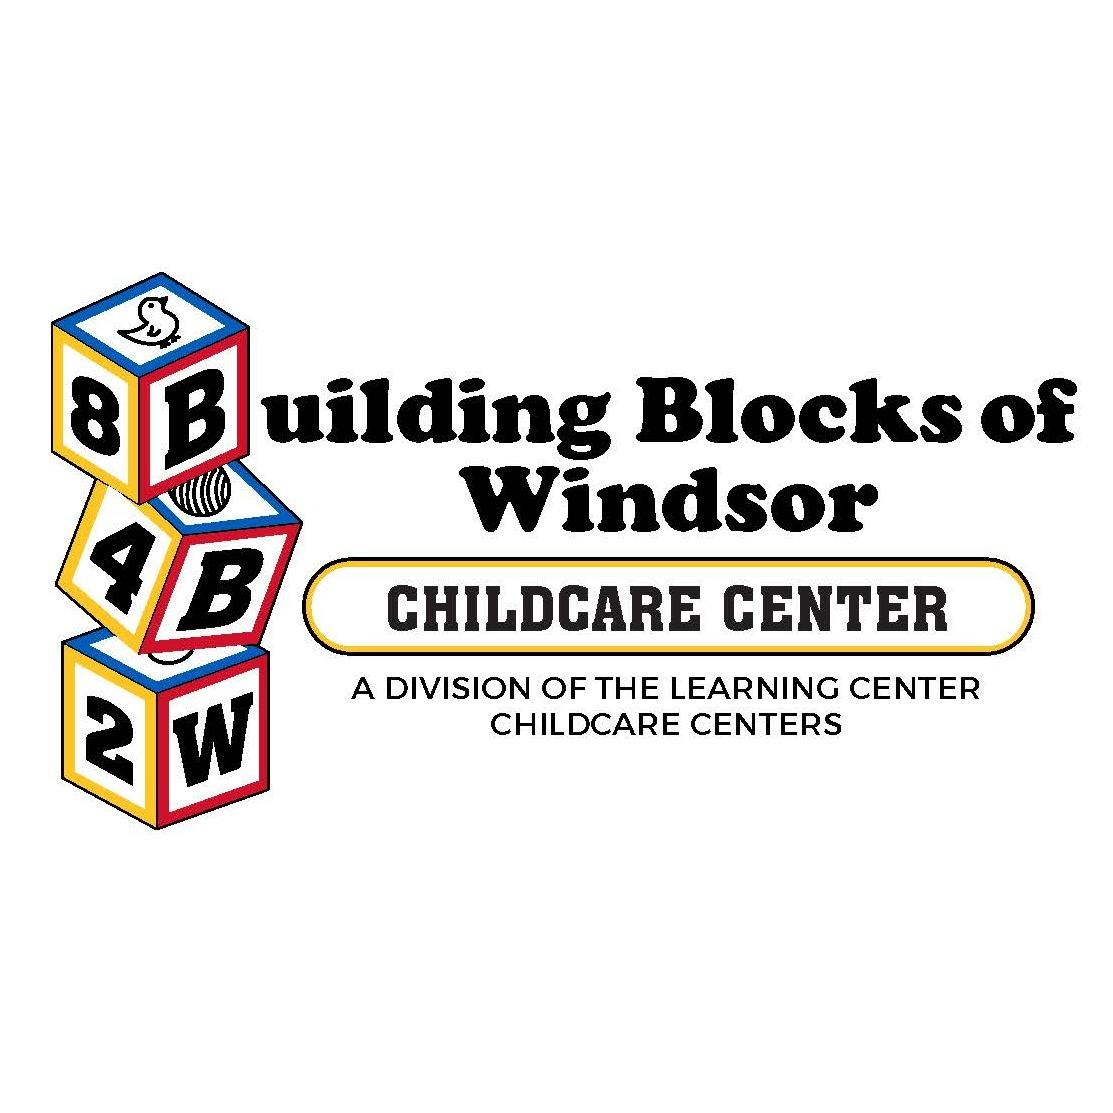 Building Blocks of Windsor